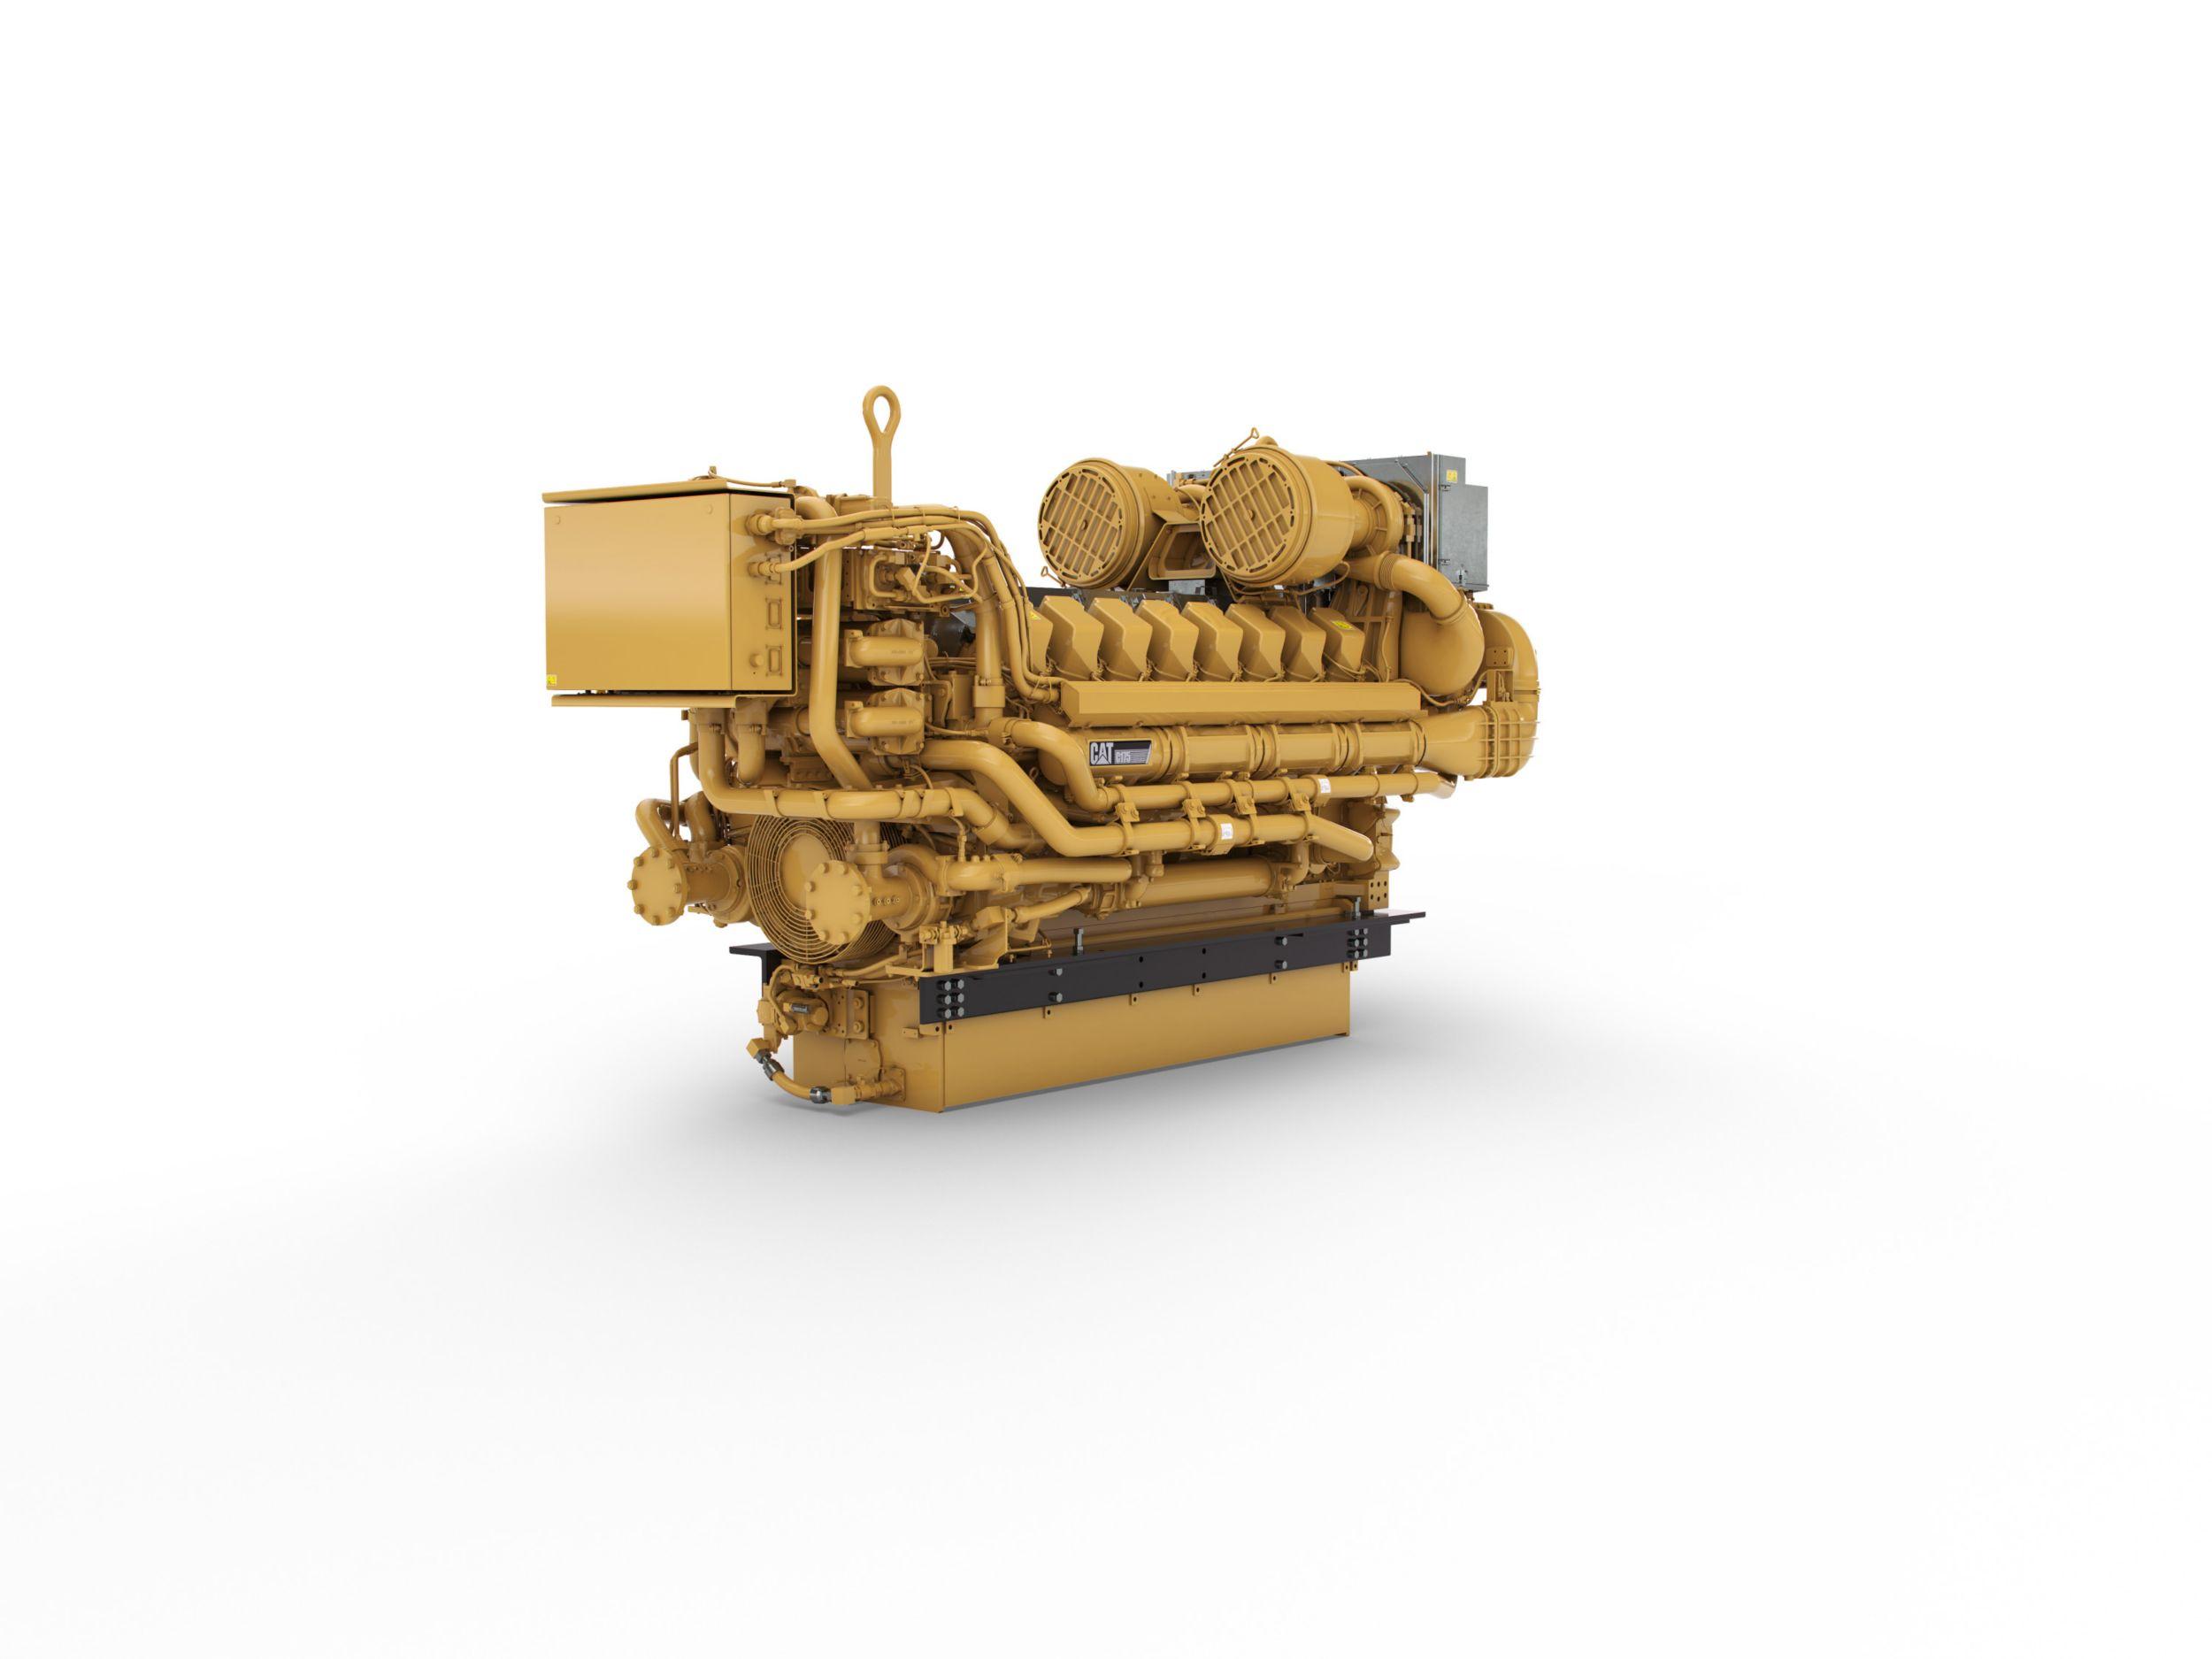 C176-16 Marine Propulsion Engine